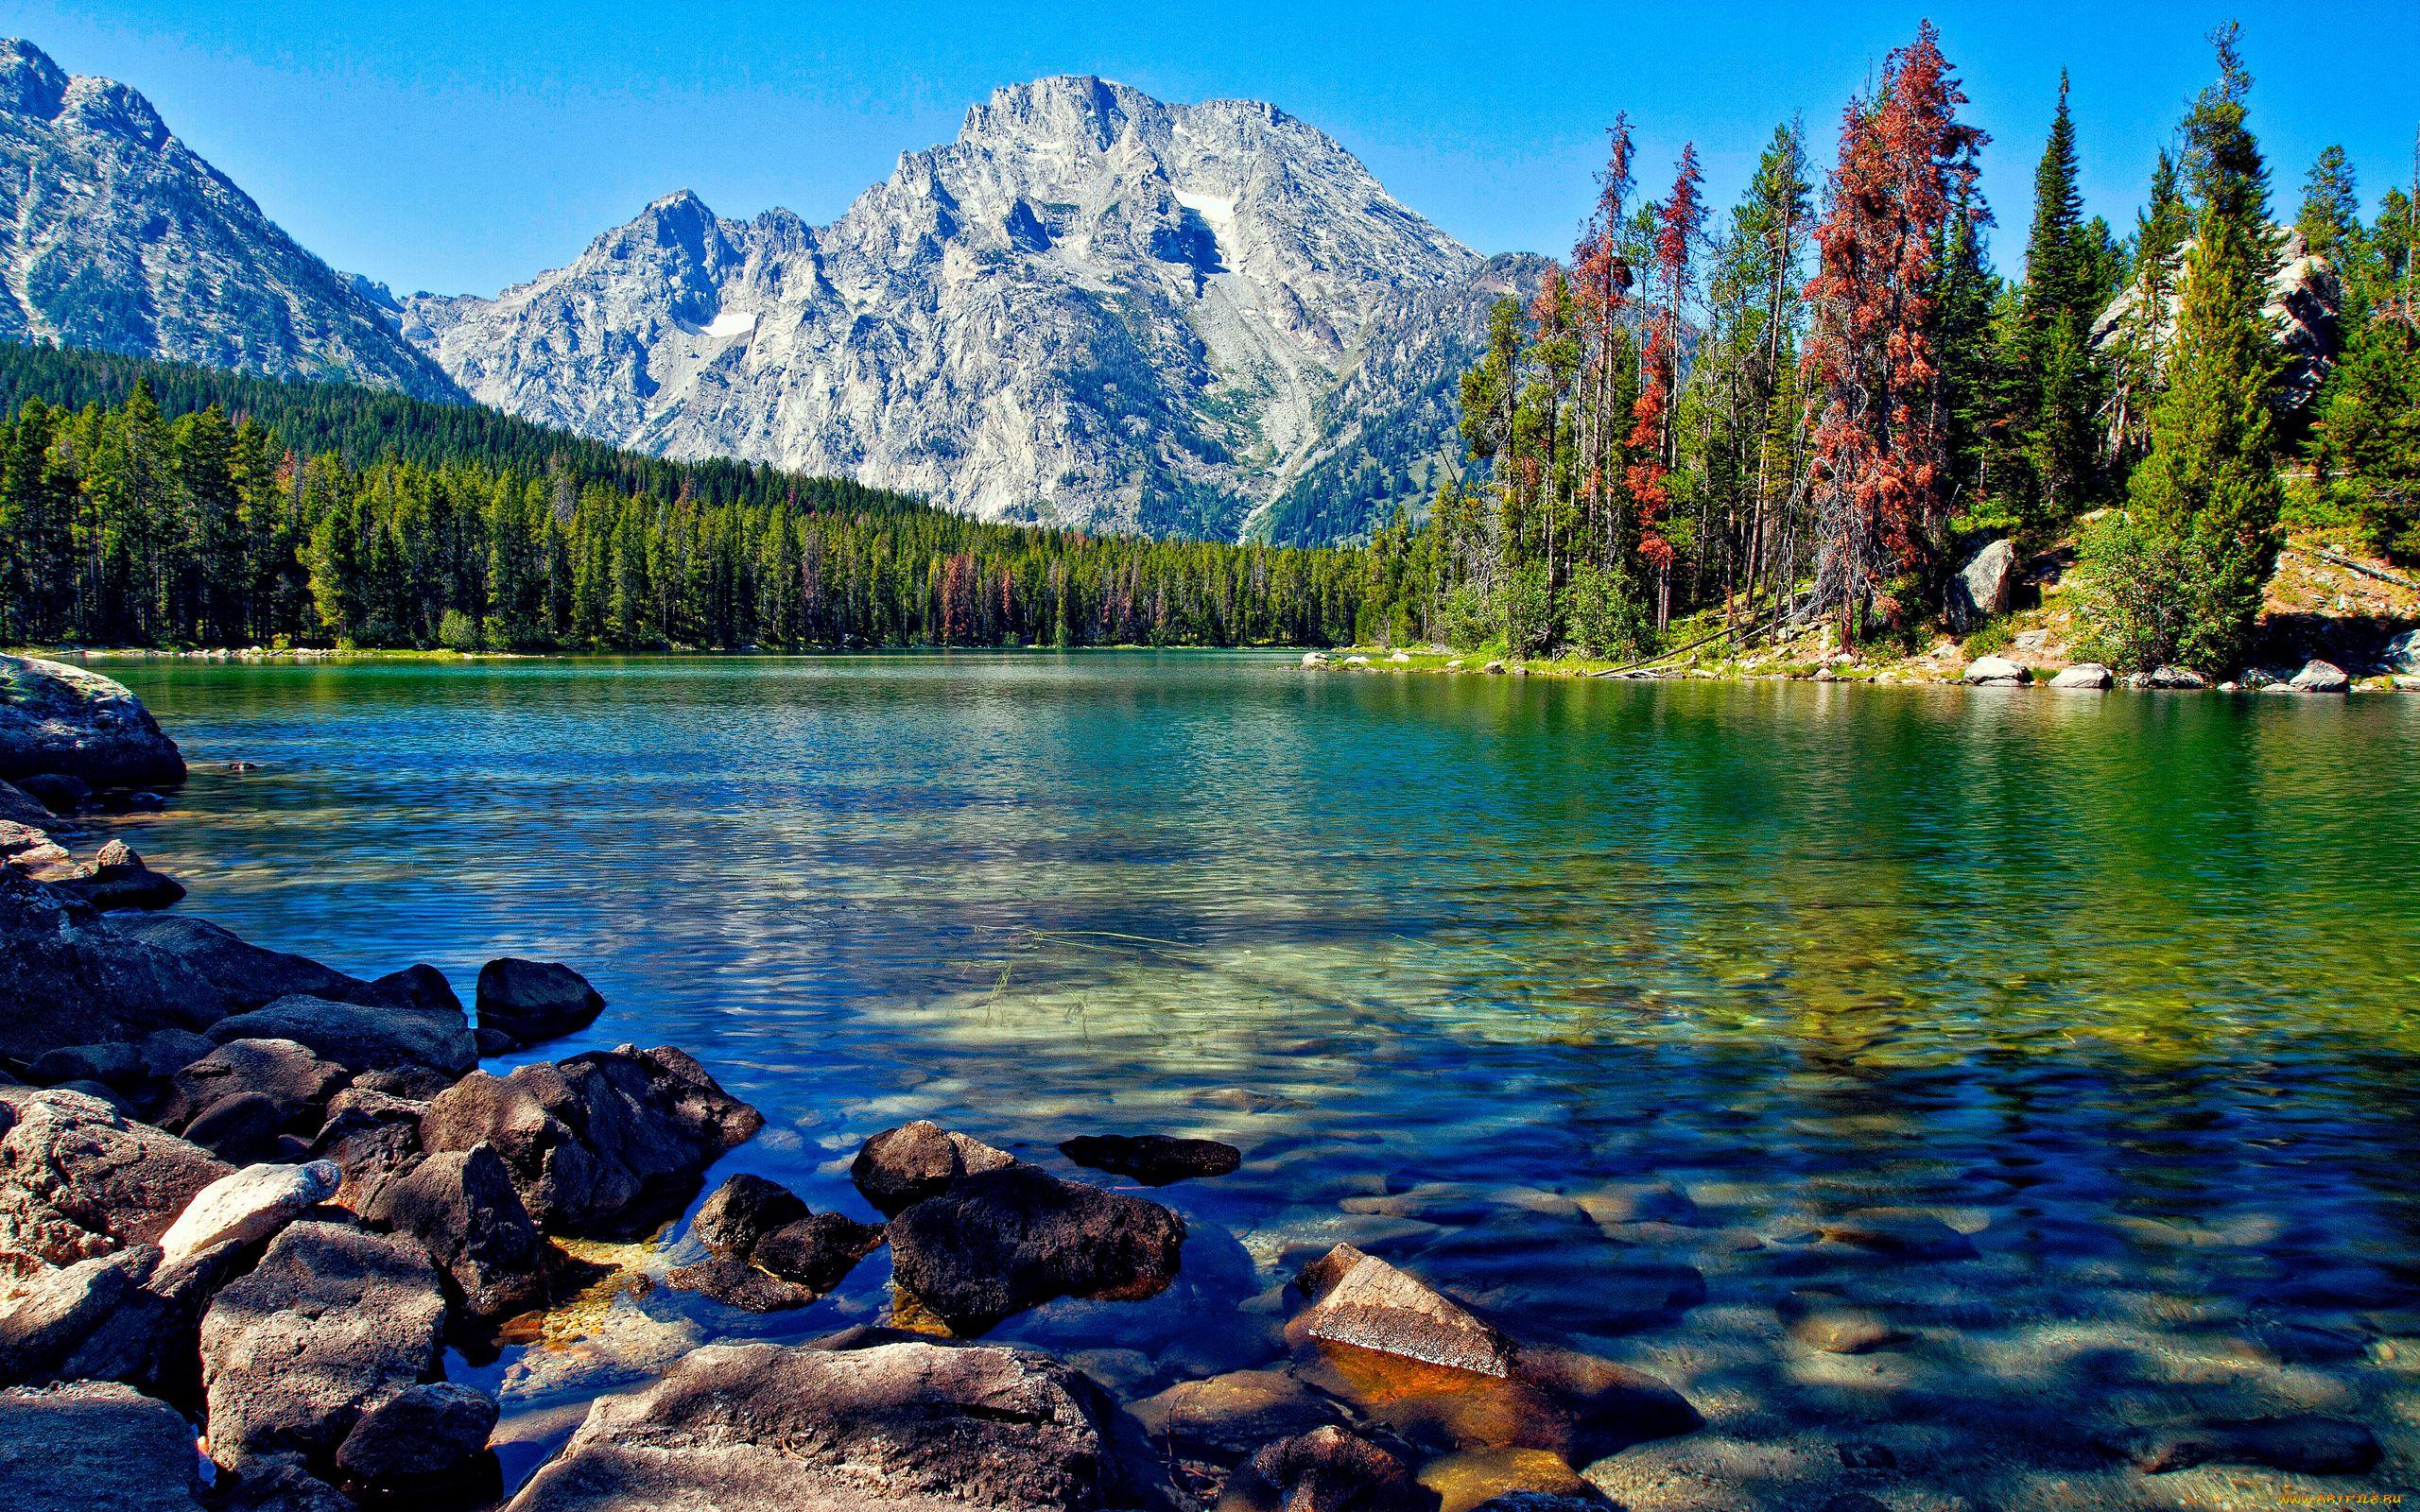 картинки озера очень красиваго установочную площадку, оперативно